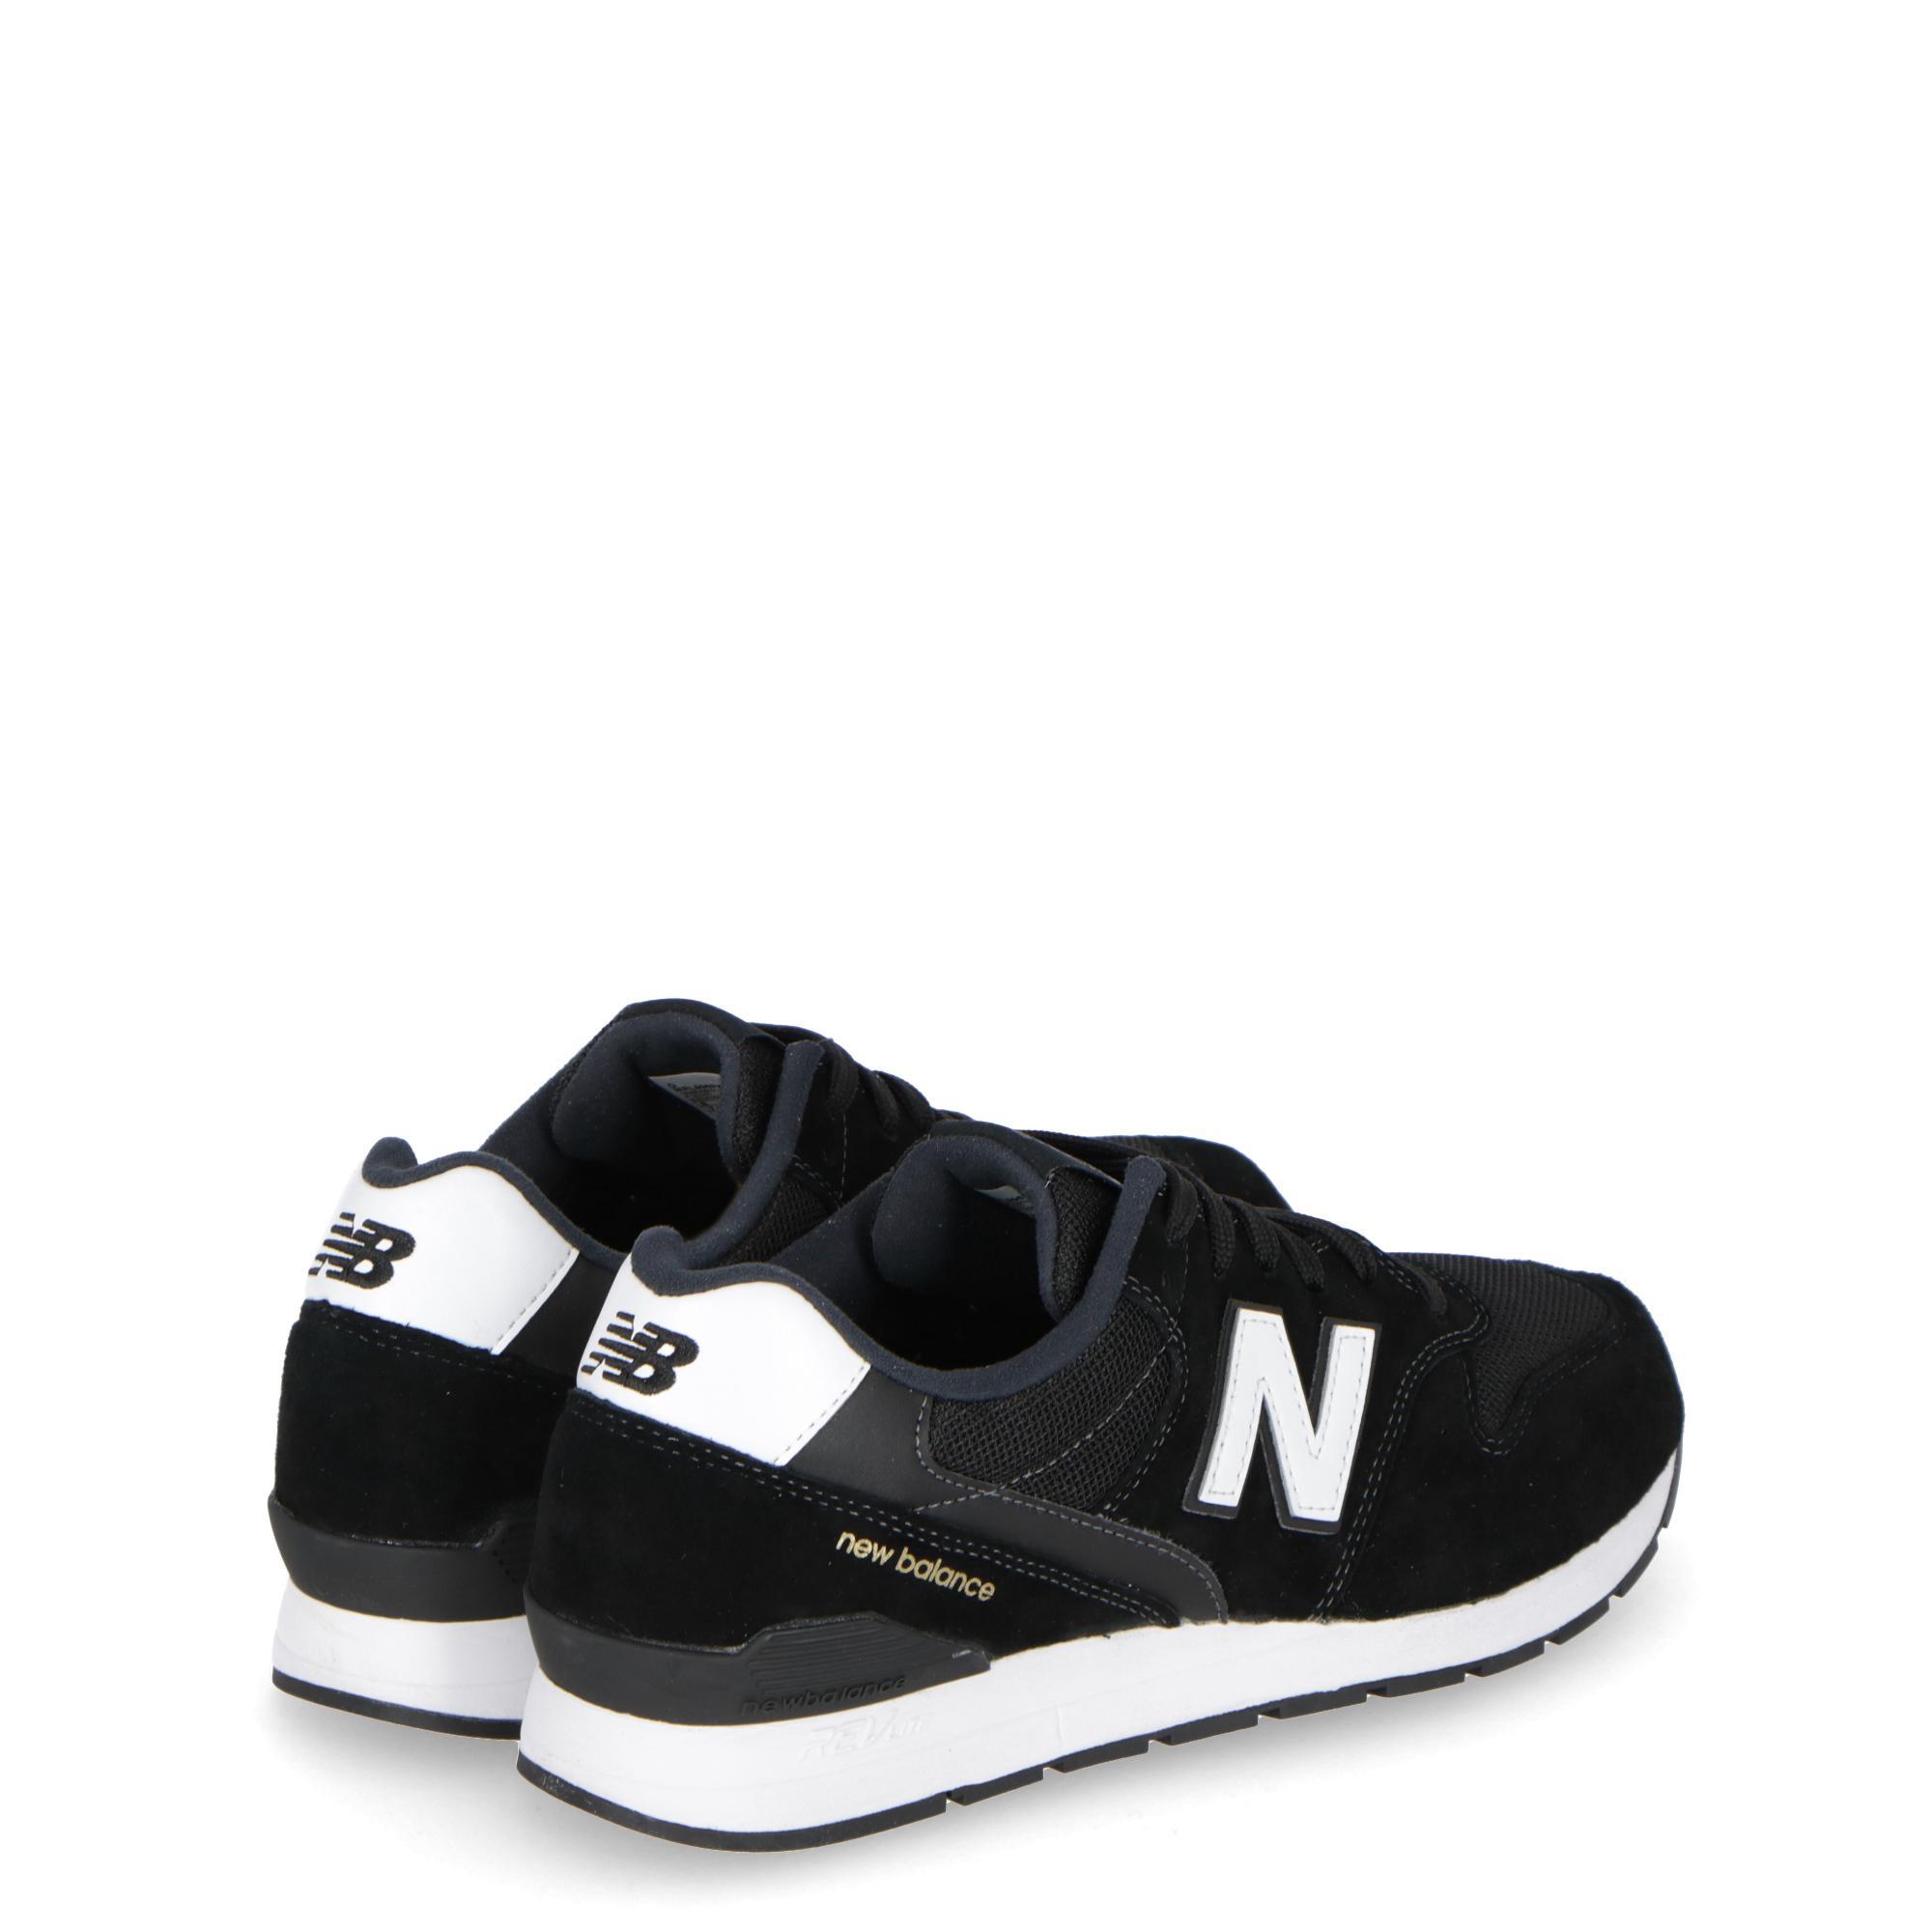 new product c8015 92d29 New Balance 996 Black